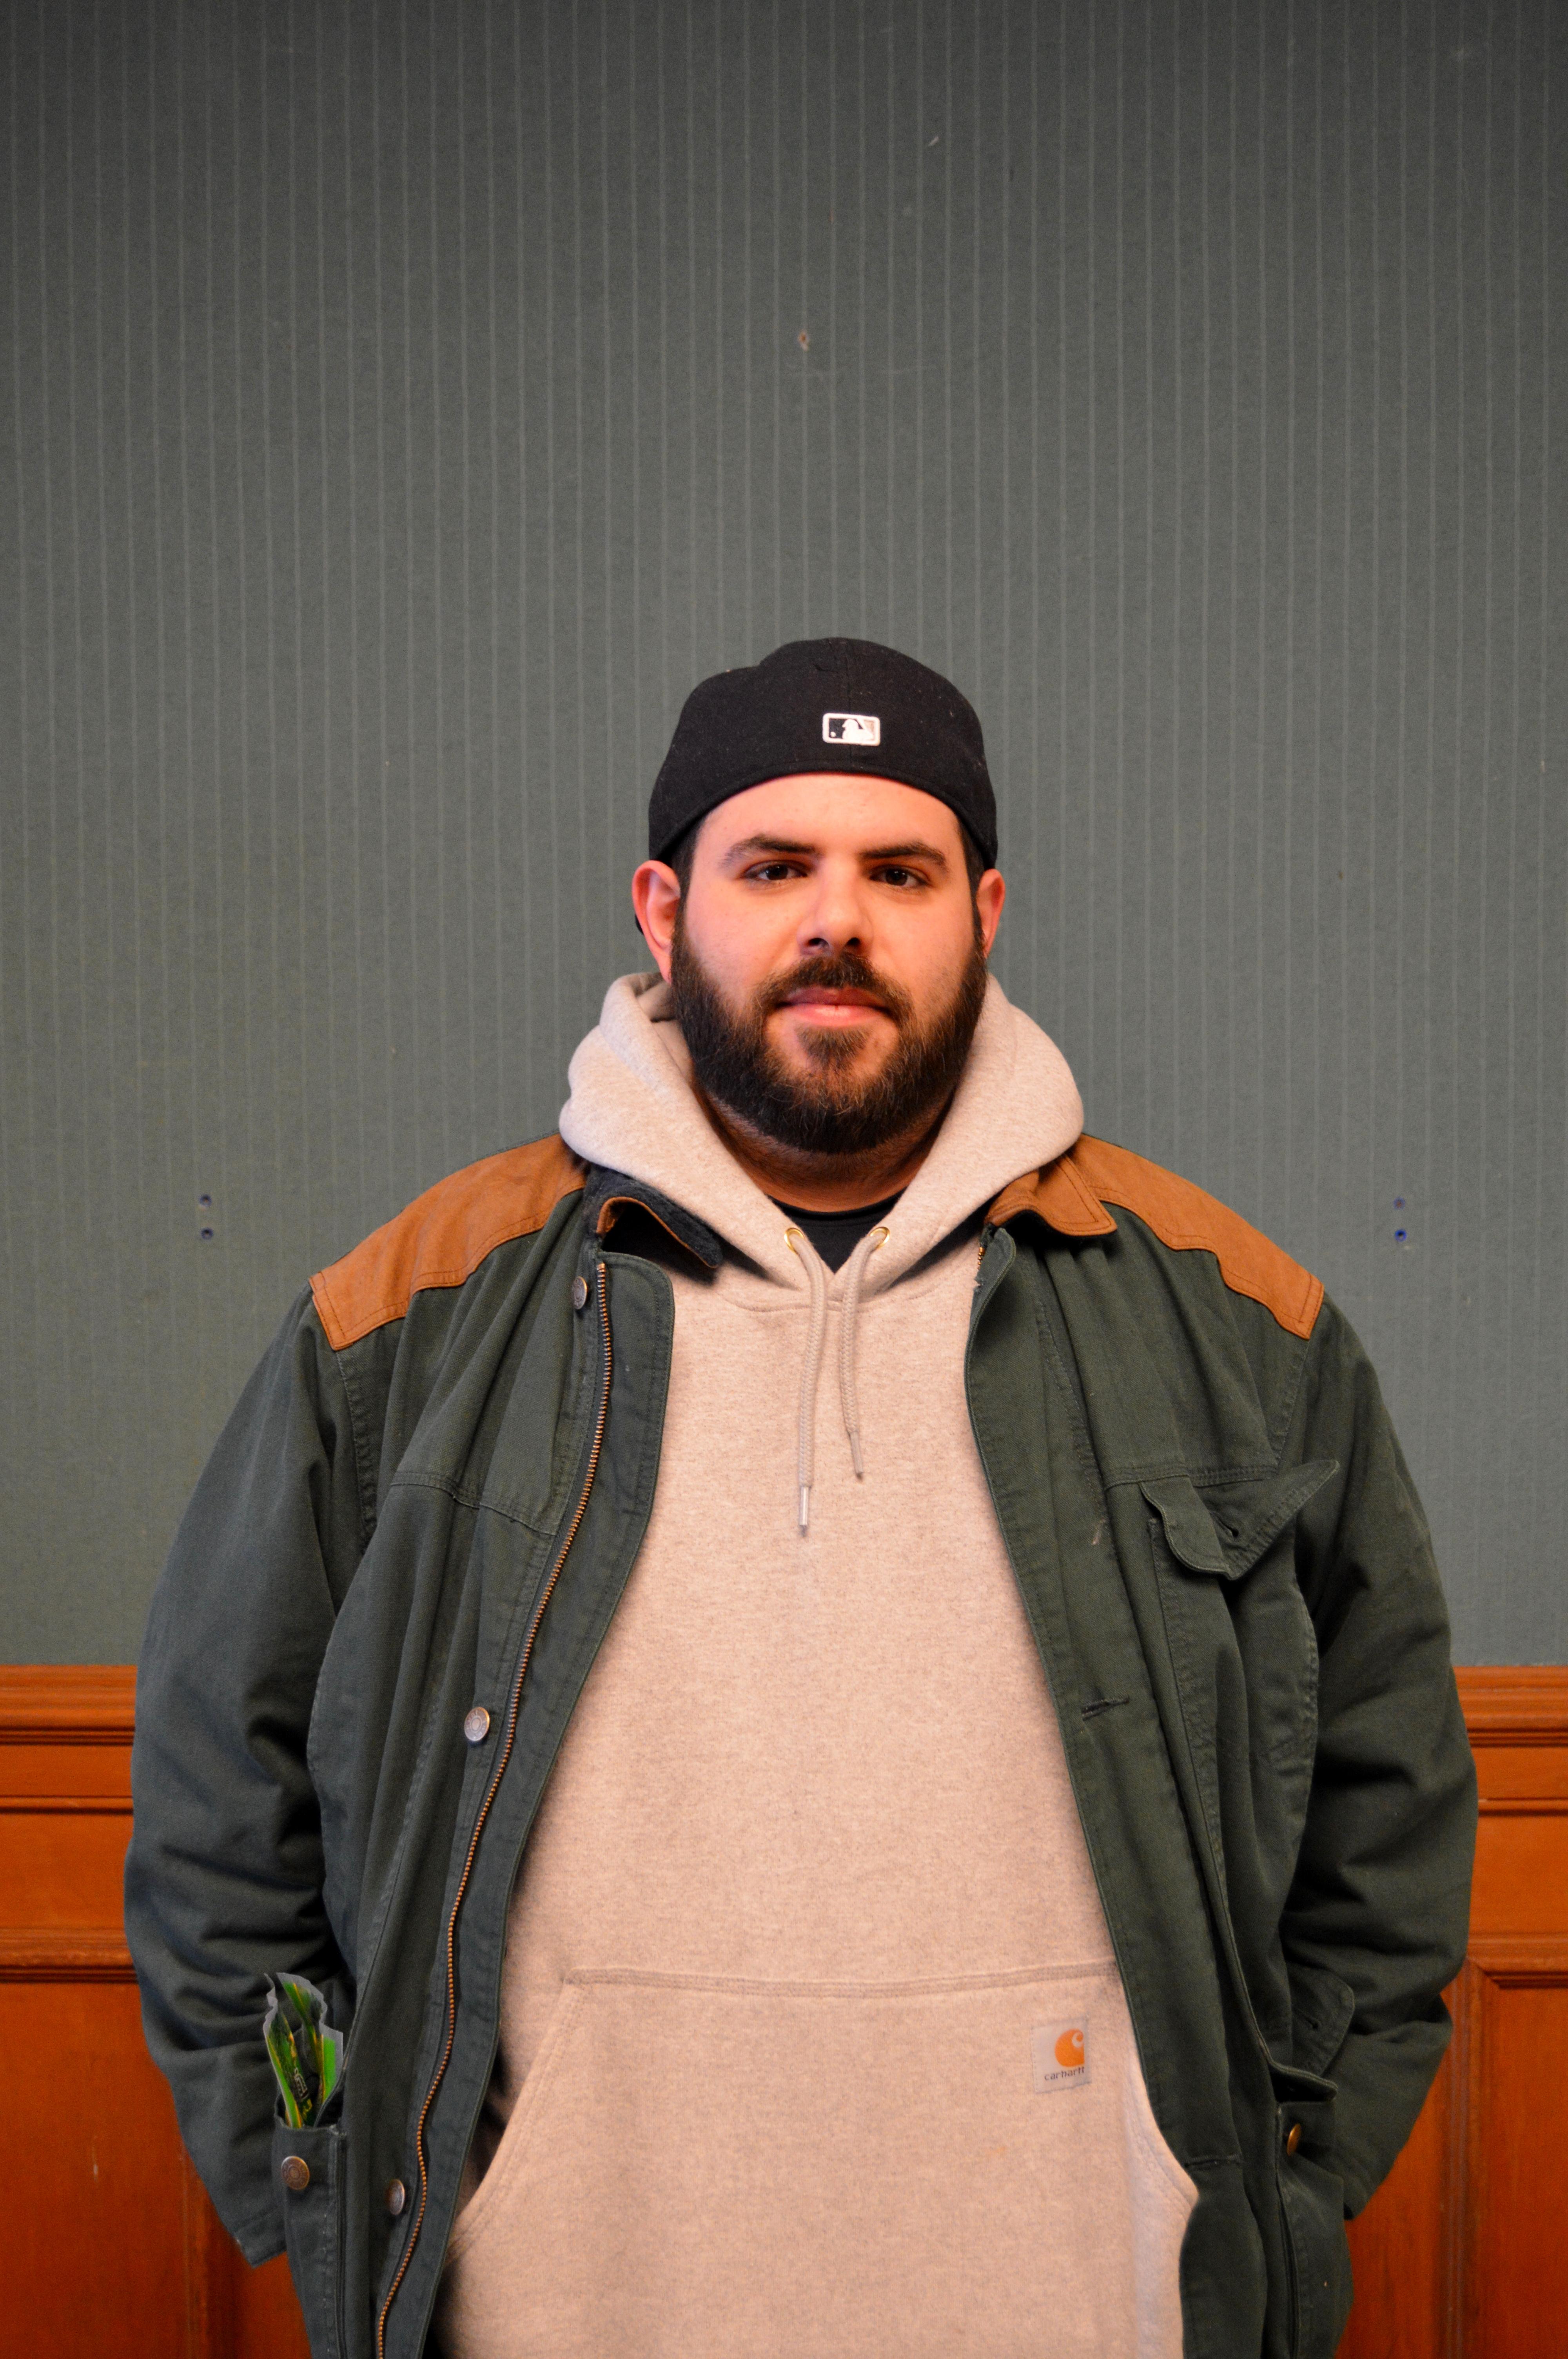 Phillip Aievoli, freshman English major, will spearhead the new literary magazine. Photo: Janisha Sanford